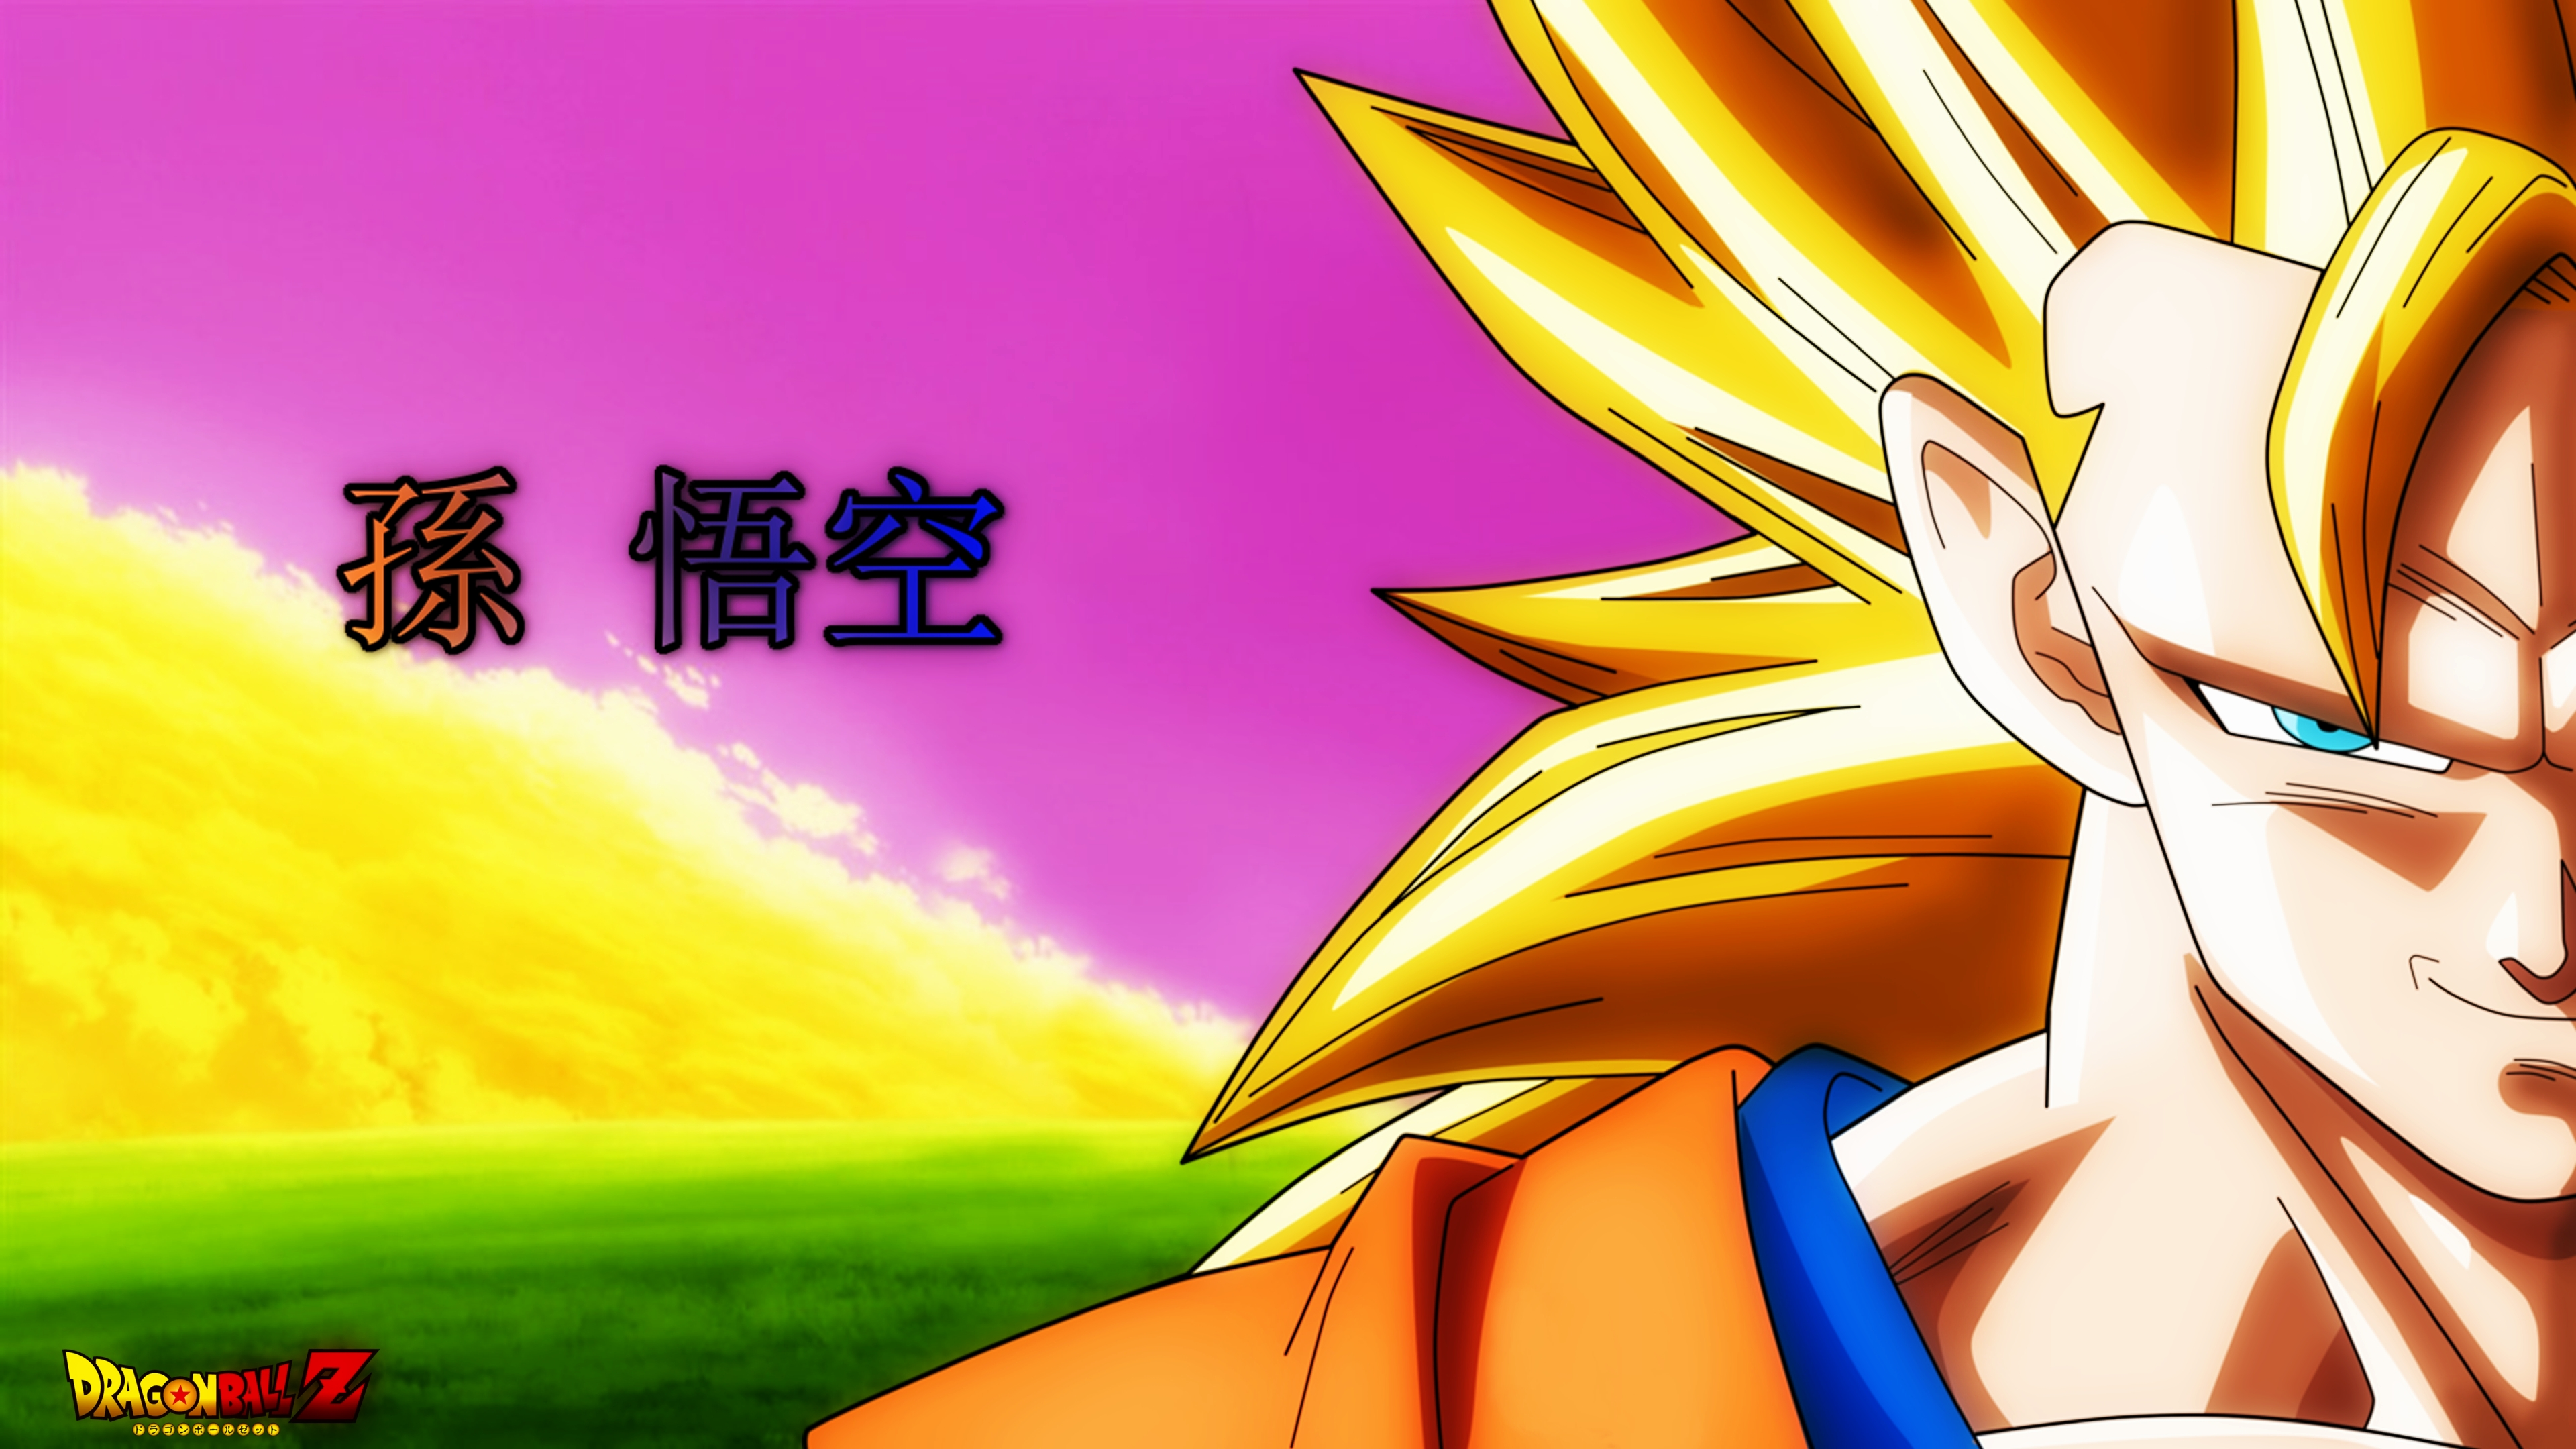 DragonBall: Z - Goku Super Saiyan 3 - Wallpaper 4K by ...